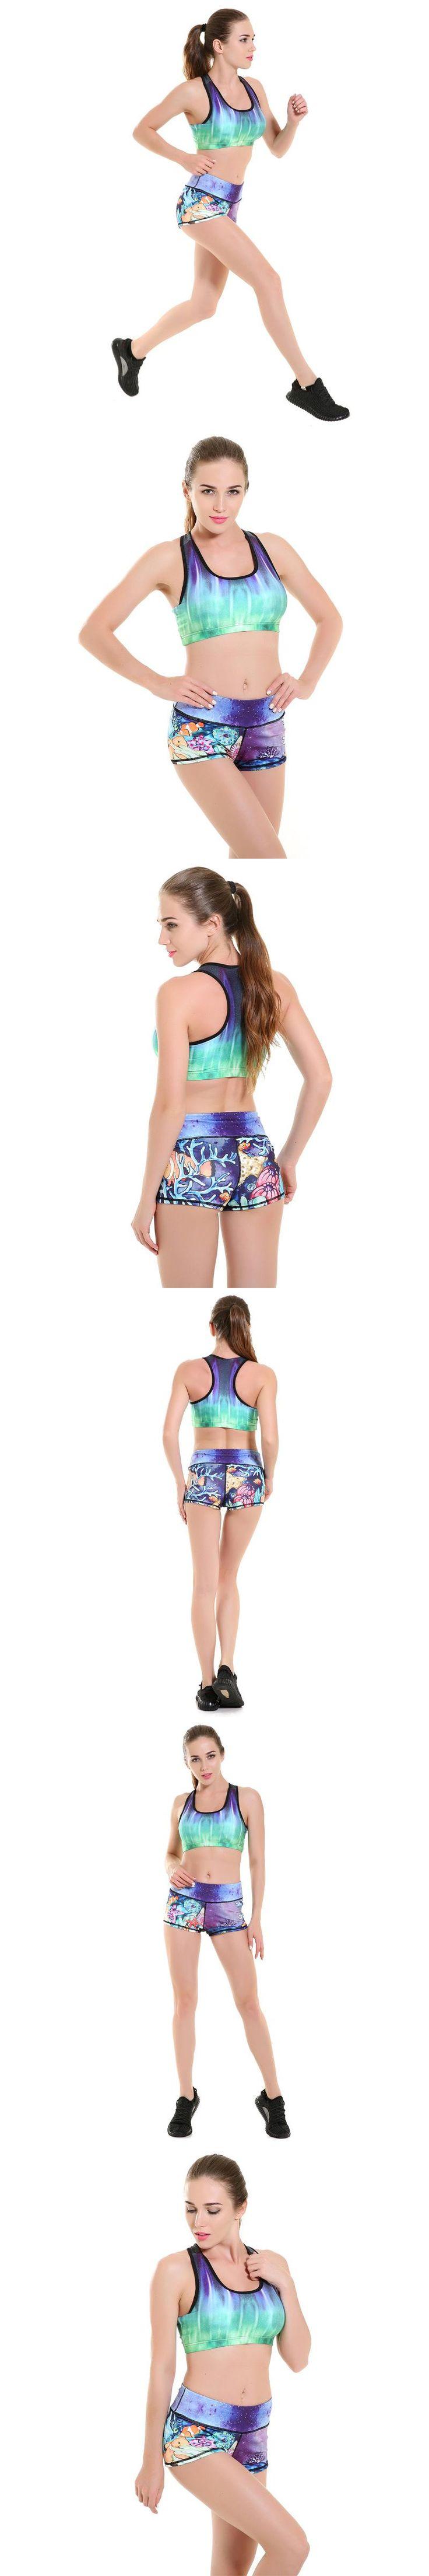 Womens Hot Sexy Super Elastic Active Workout Shorts Woman Underwater World cartoon printing Summer Fashion Beauty Shorts